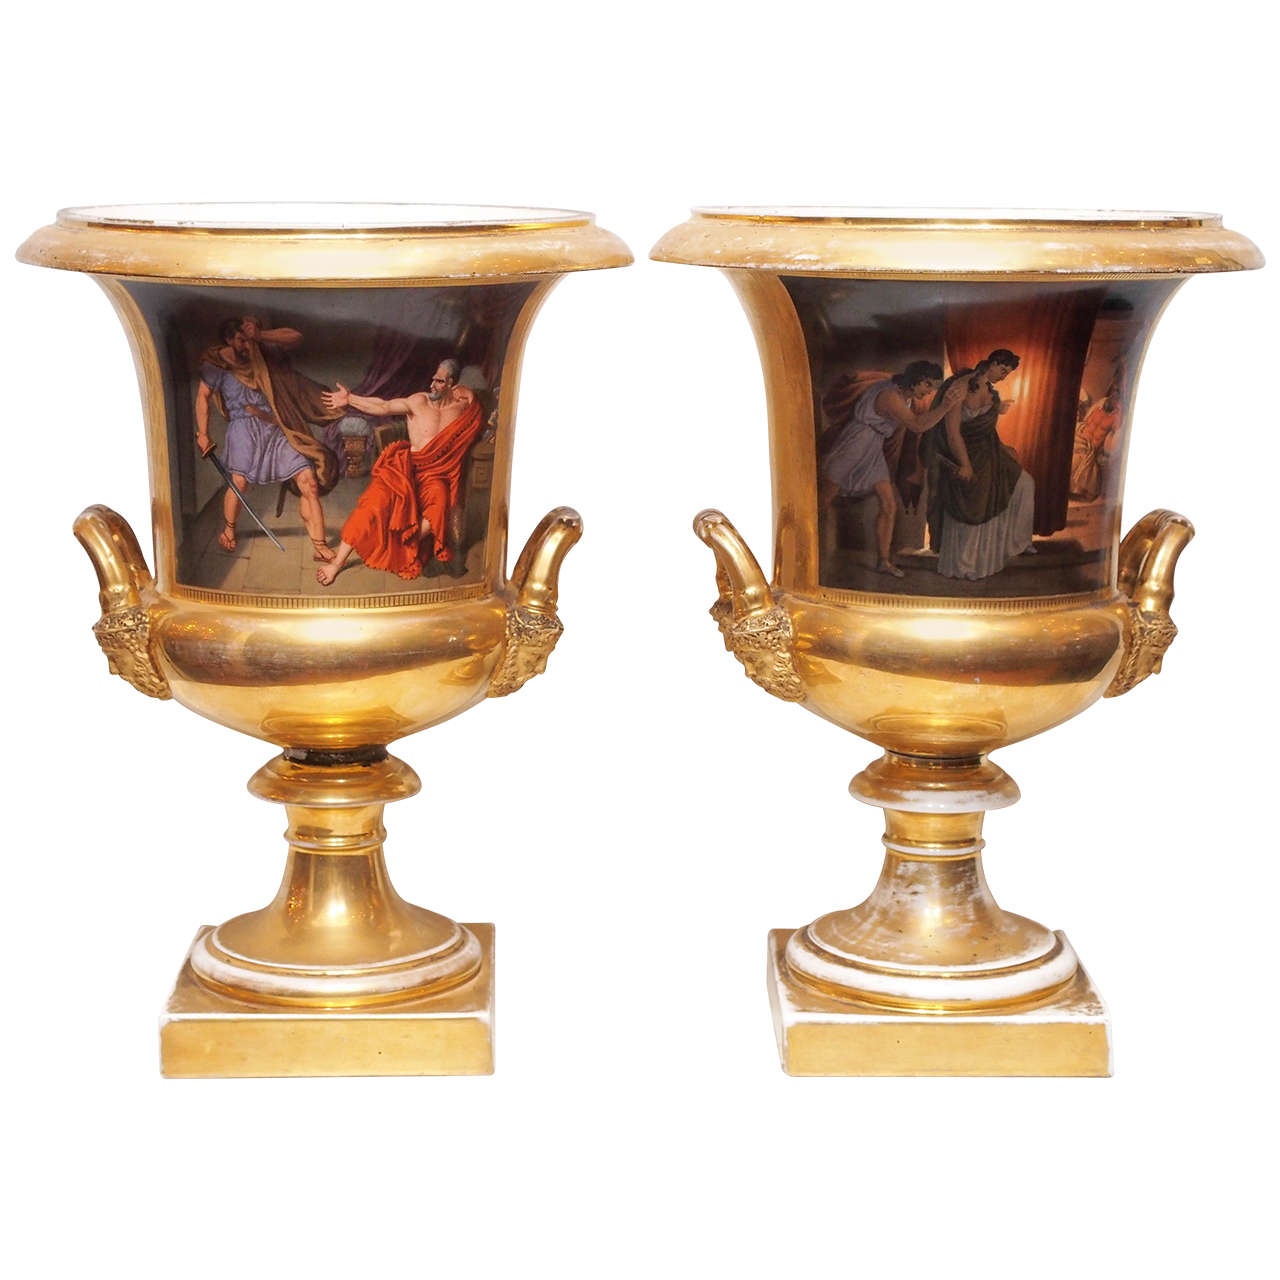 Pair of Vieux Paris Porcelain Campagna Urns